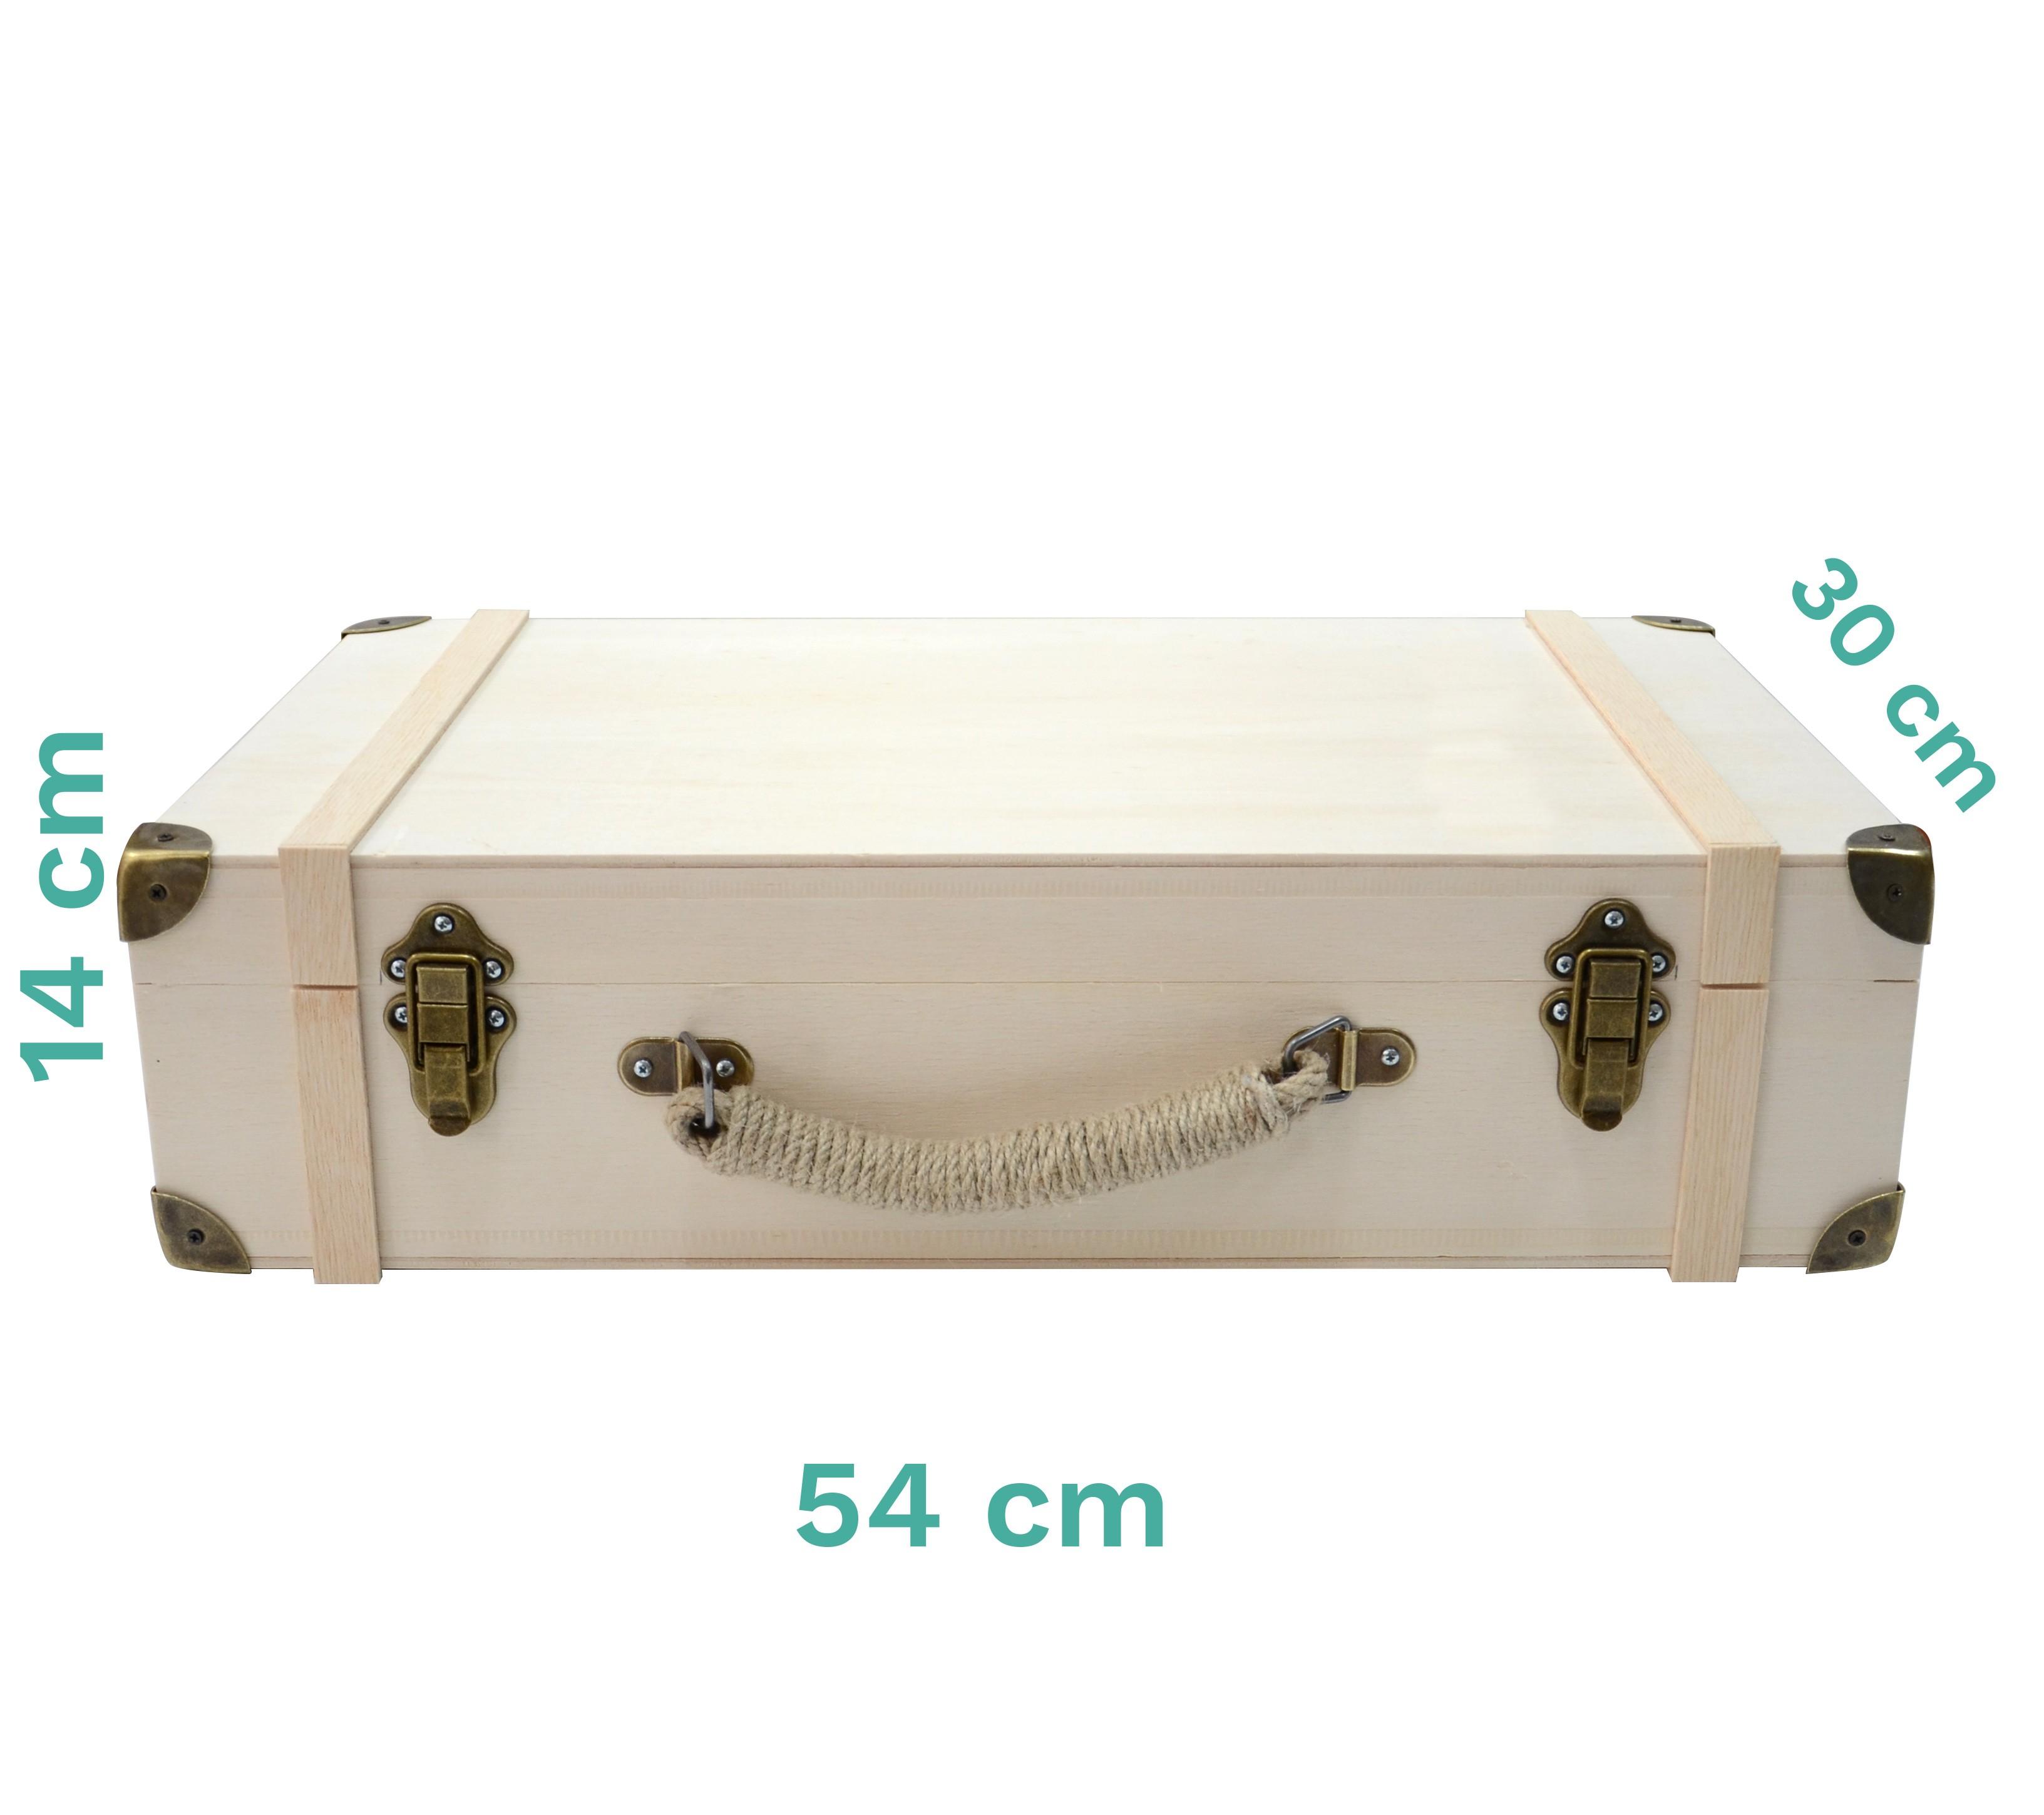 Bizart Bavul Masif Ahşap (Orta Boy)